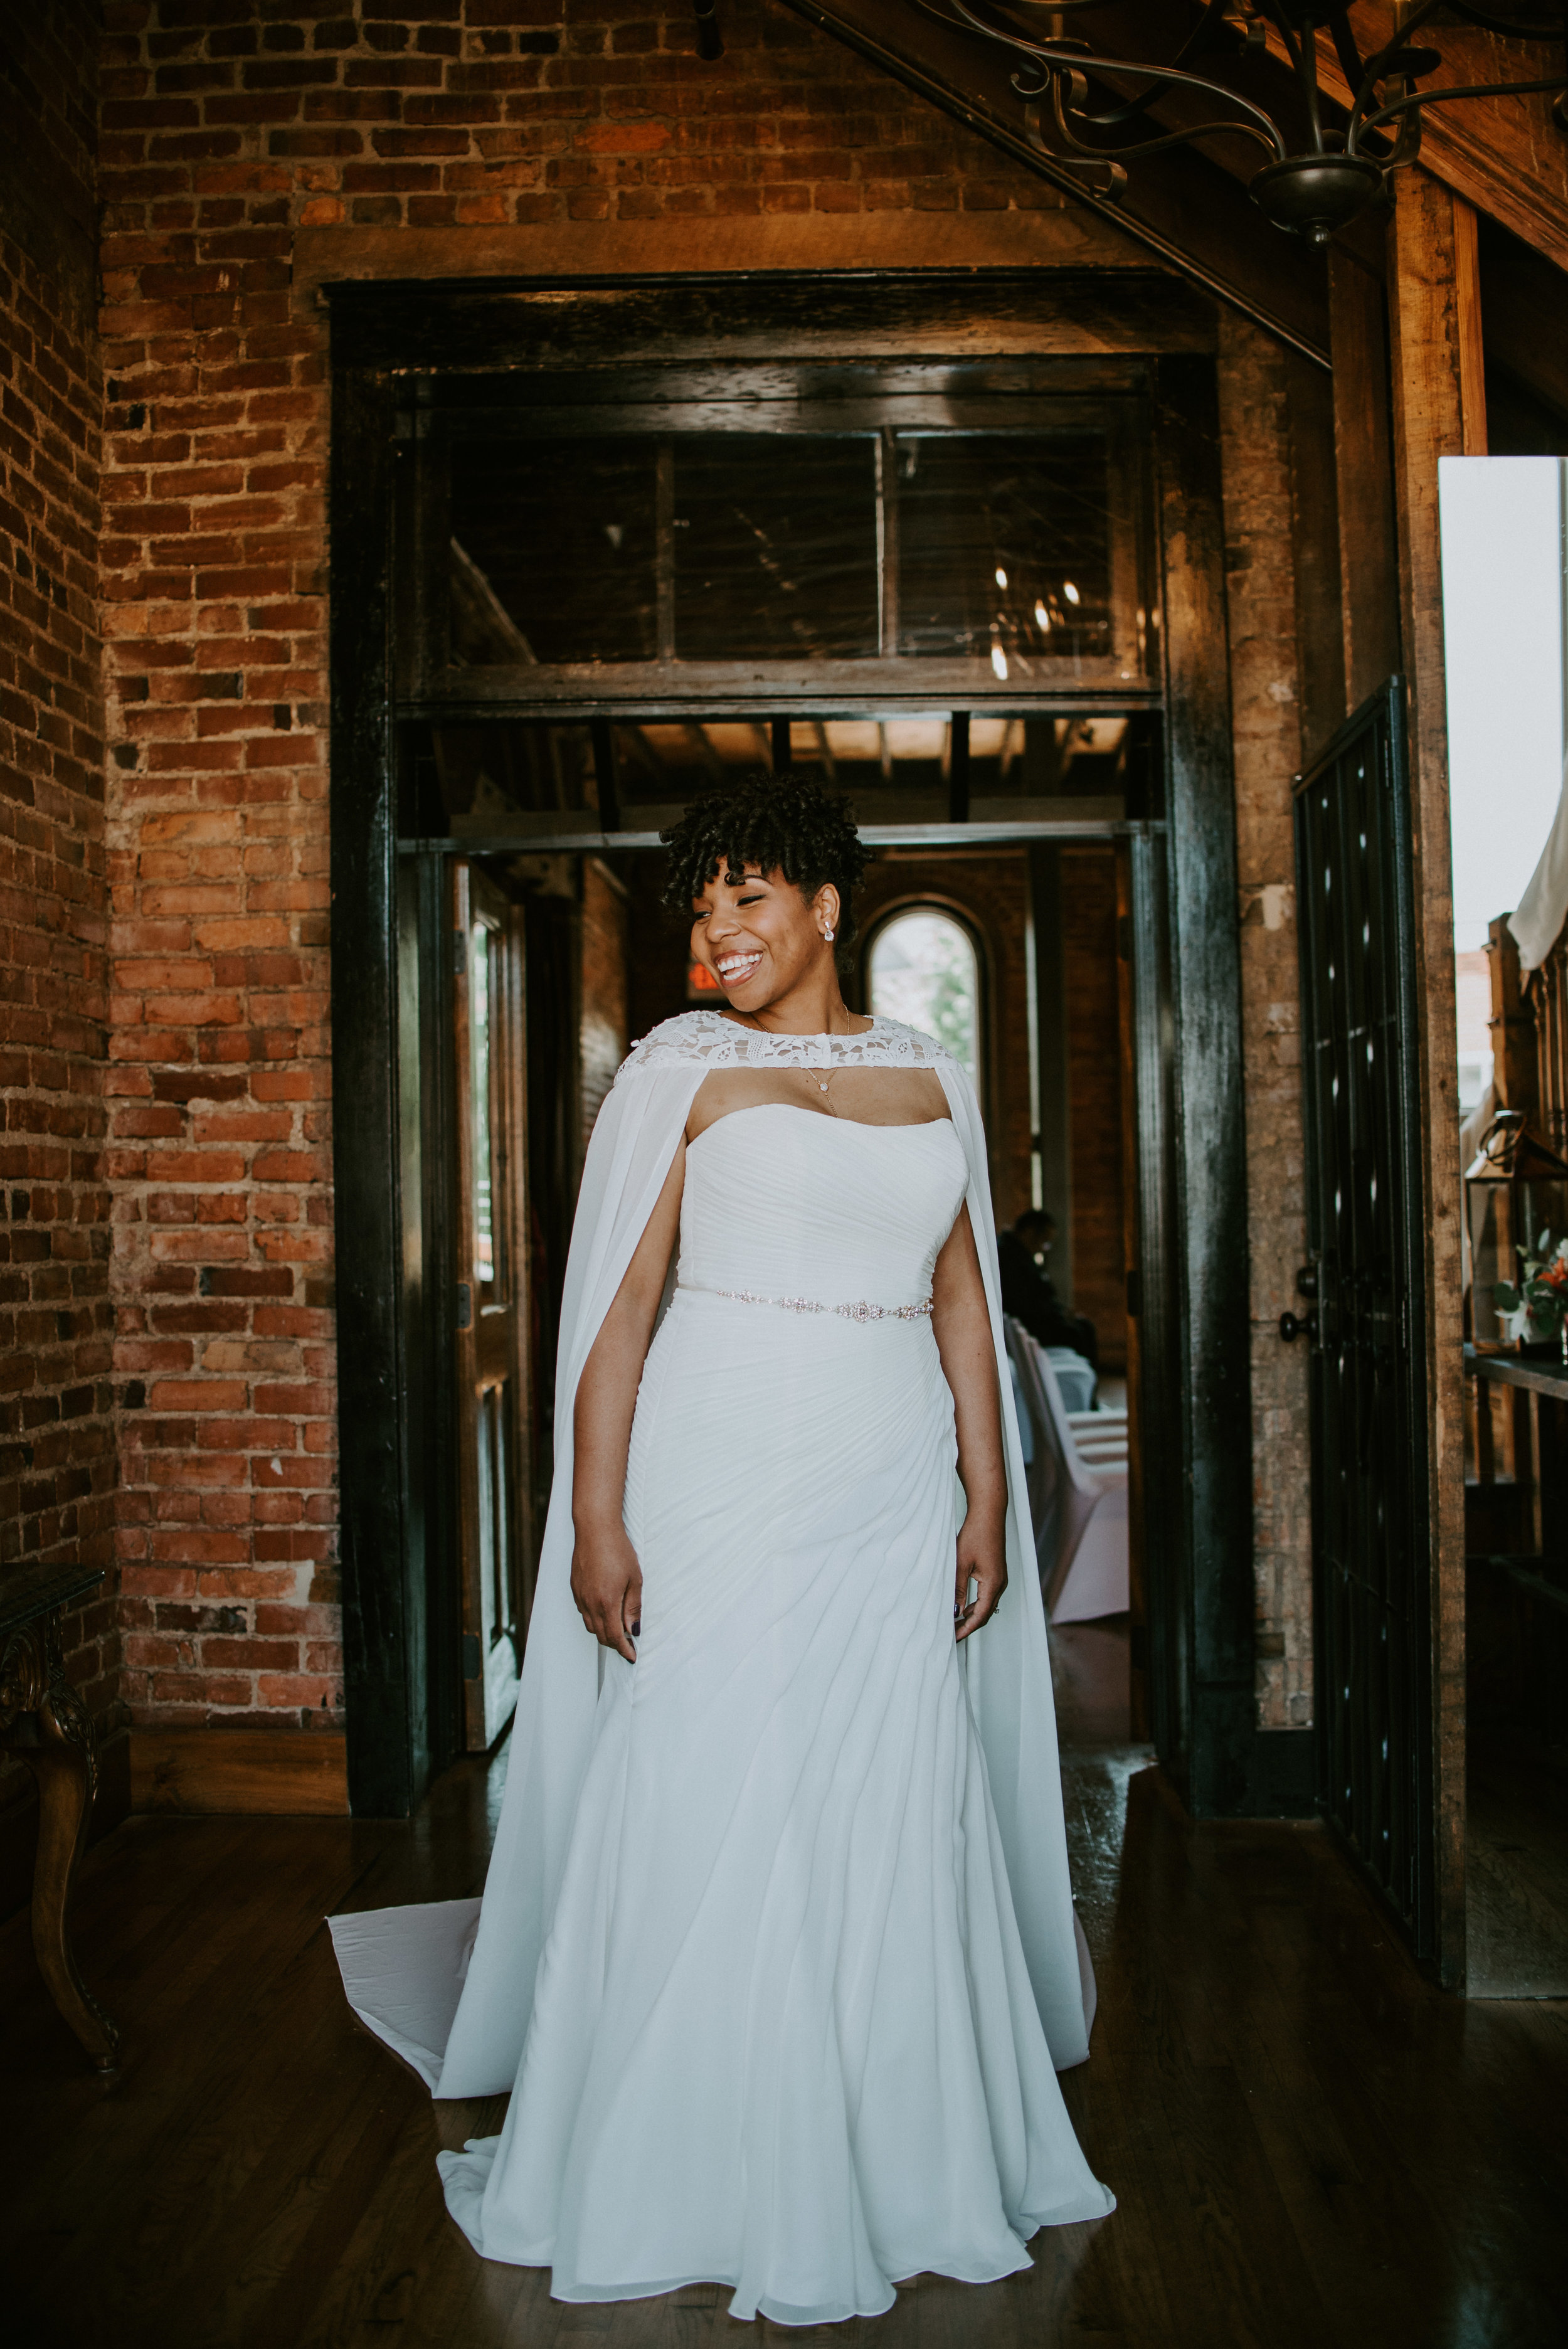 WonderlyCreative_Wedding_6.7.18_Khara&Dwayne_-214.jpg